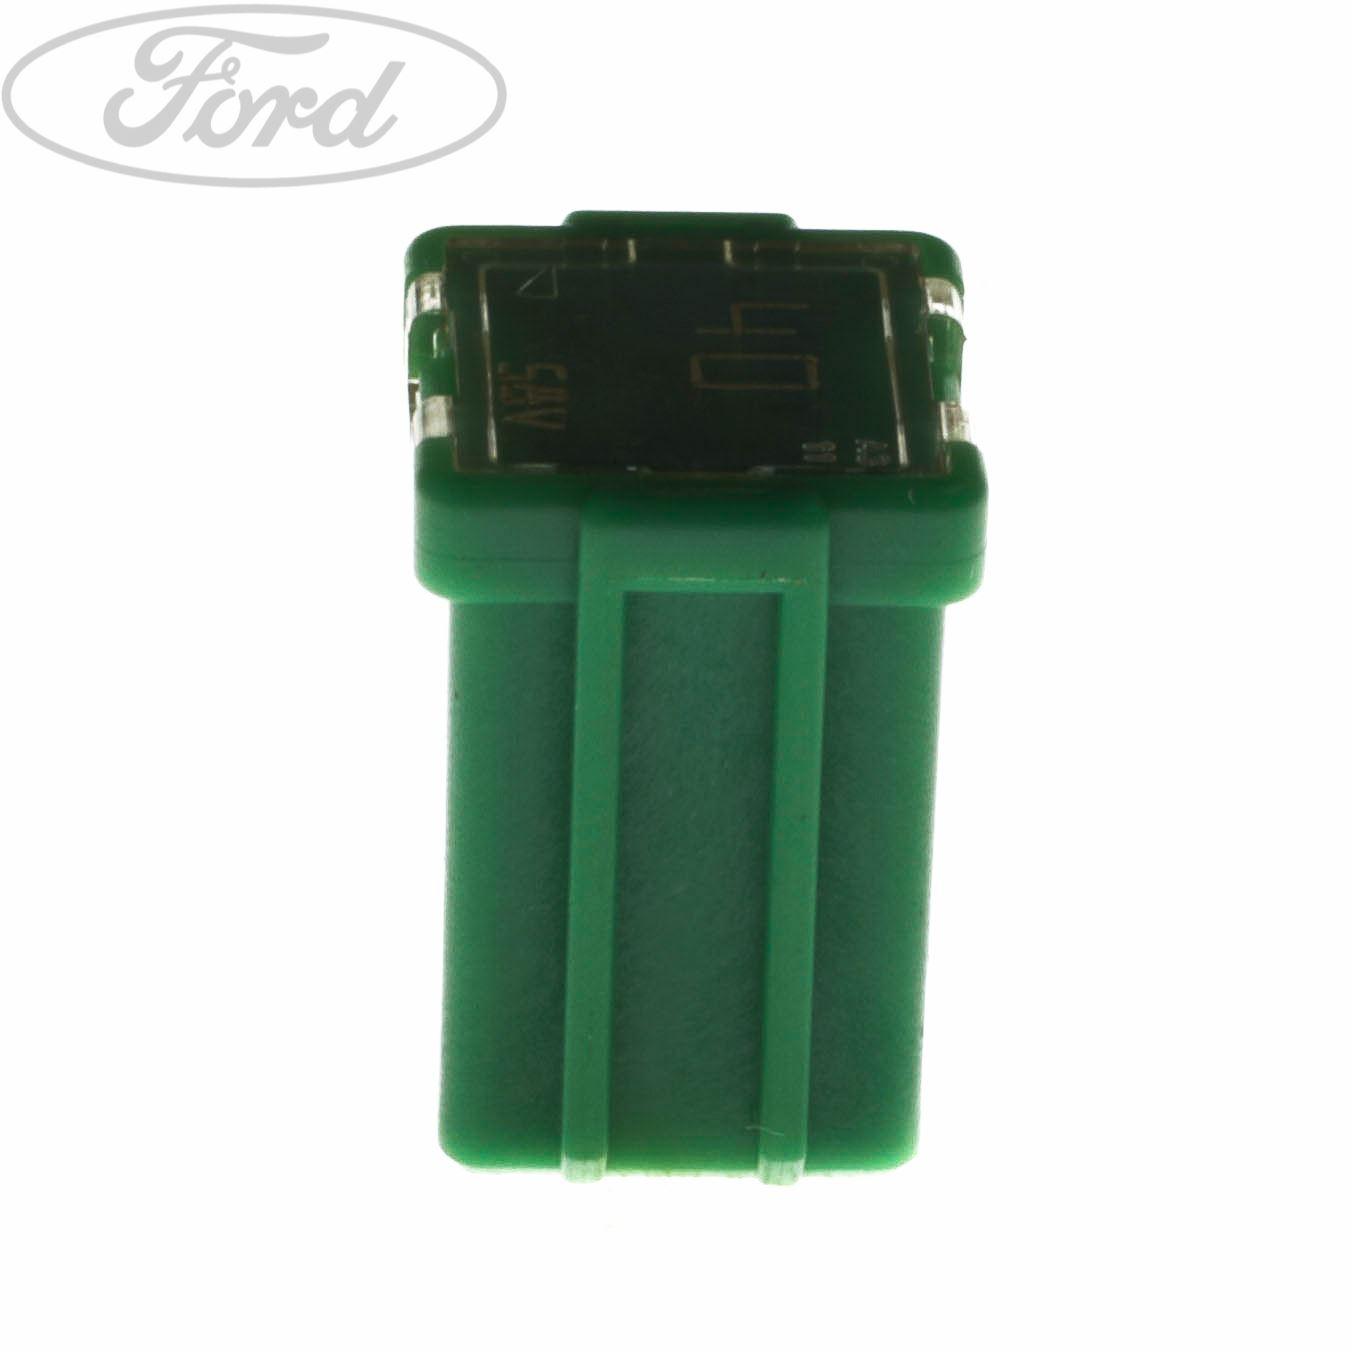 77d1a3c8-865f-4c20-b879-b2557788b7de Ford Fiesta Mk Fuse Box on chrysler lhs fuse box, chevrolet cruze fuse box, ford fiesta horn fuse, chevrolet equinox fuse box, lincoln continental fuse box, nissan juke fuse box, geo metro fuse box, lincoln mark lt fuse box, honda s2000 fuse box, buick lesabre fuse box, cadillac srx fuse box, ford fiesta windshield, chrysler grand voyager fuse box, toyota supra fuse box, mercury mariner fuse box, chrysler aspen fuse box, chevrolet impala fuse box, pontiac firebird fuse box, ford fiesta transmission control module, suzuki kizashi fuse box,